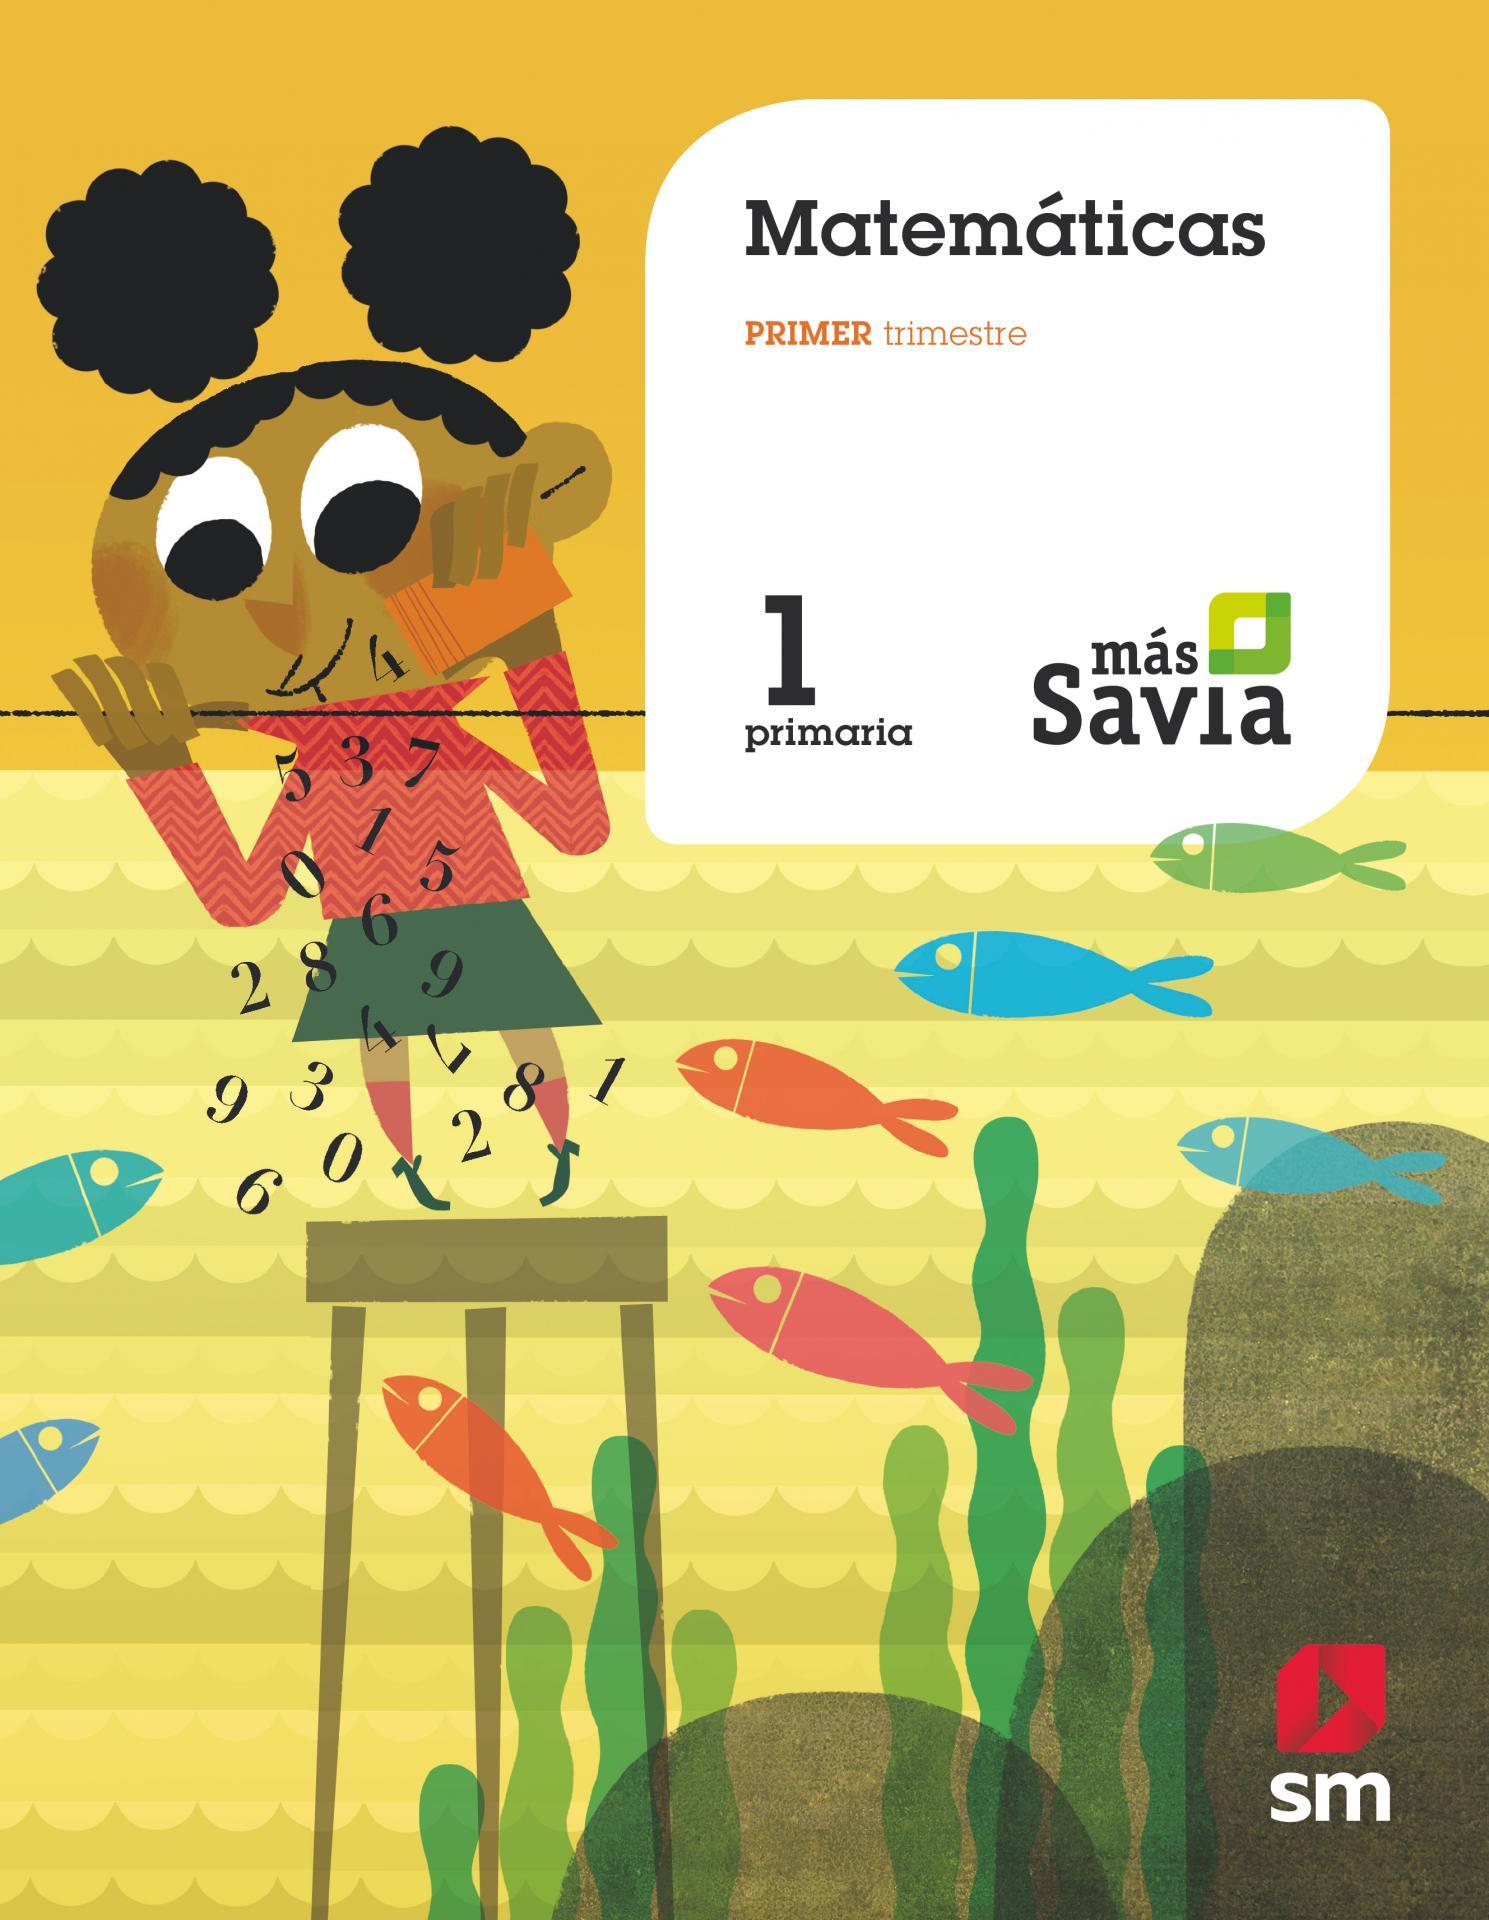 LIBRO DE TEXTO - 1 PRIMARIA MATEMÁTICAS. MÁS SAVIA